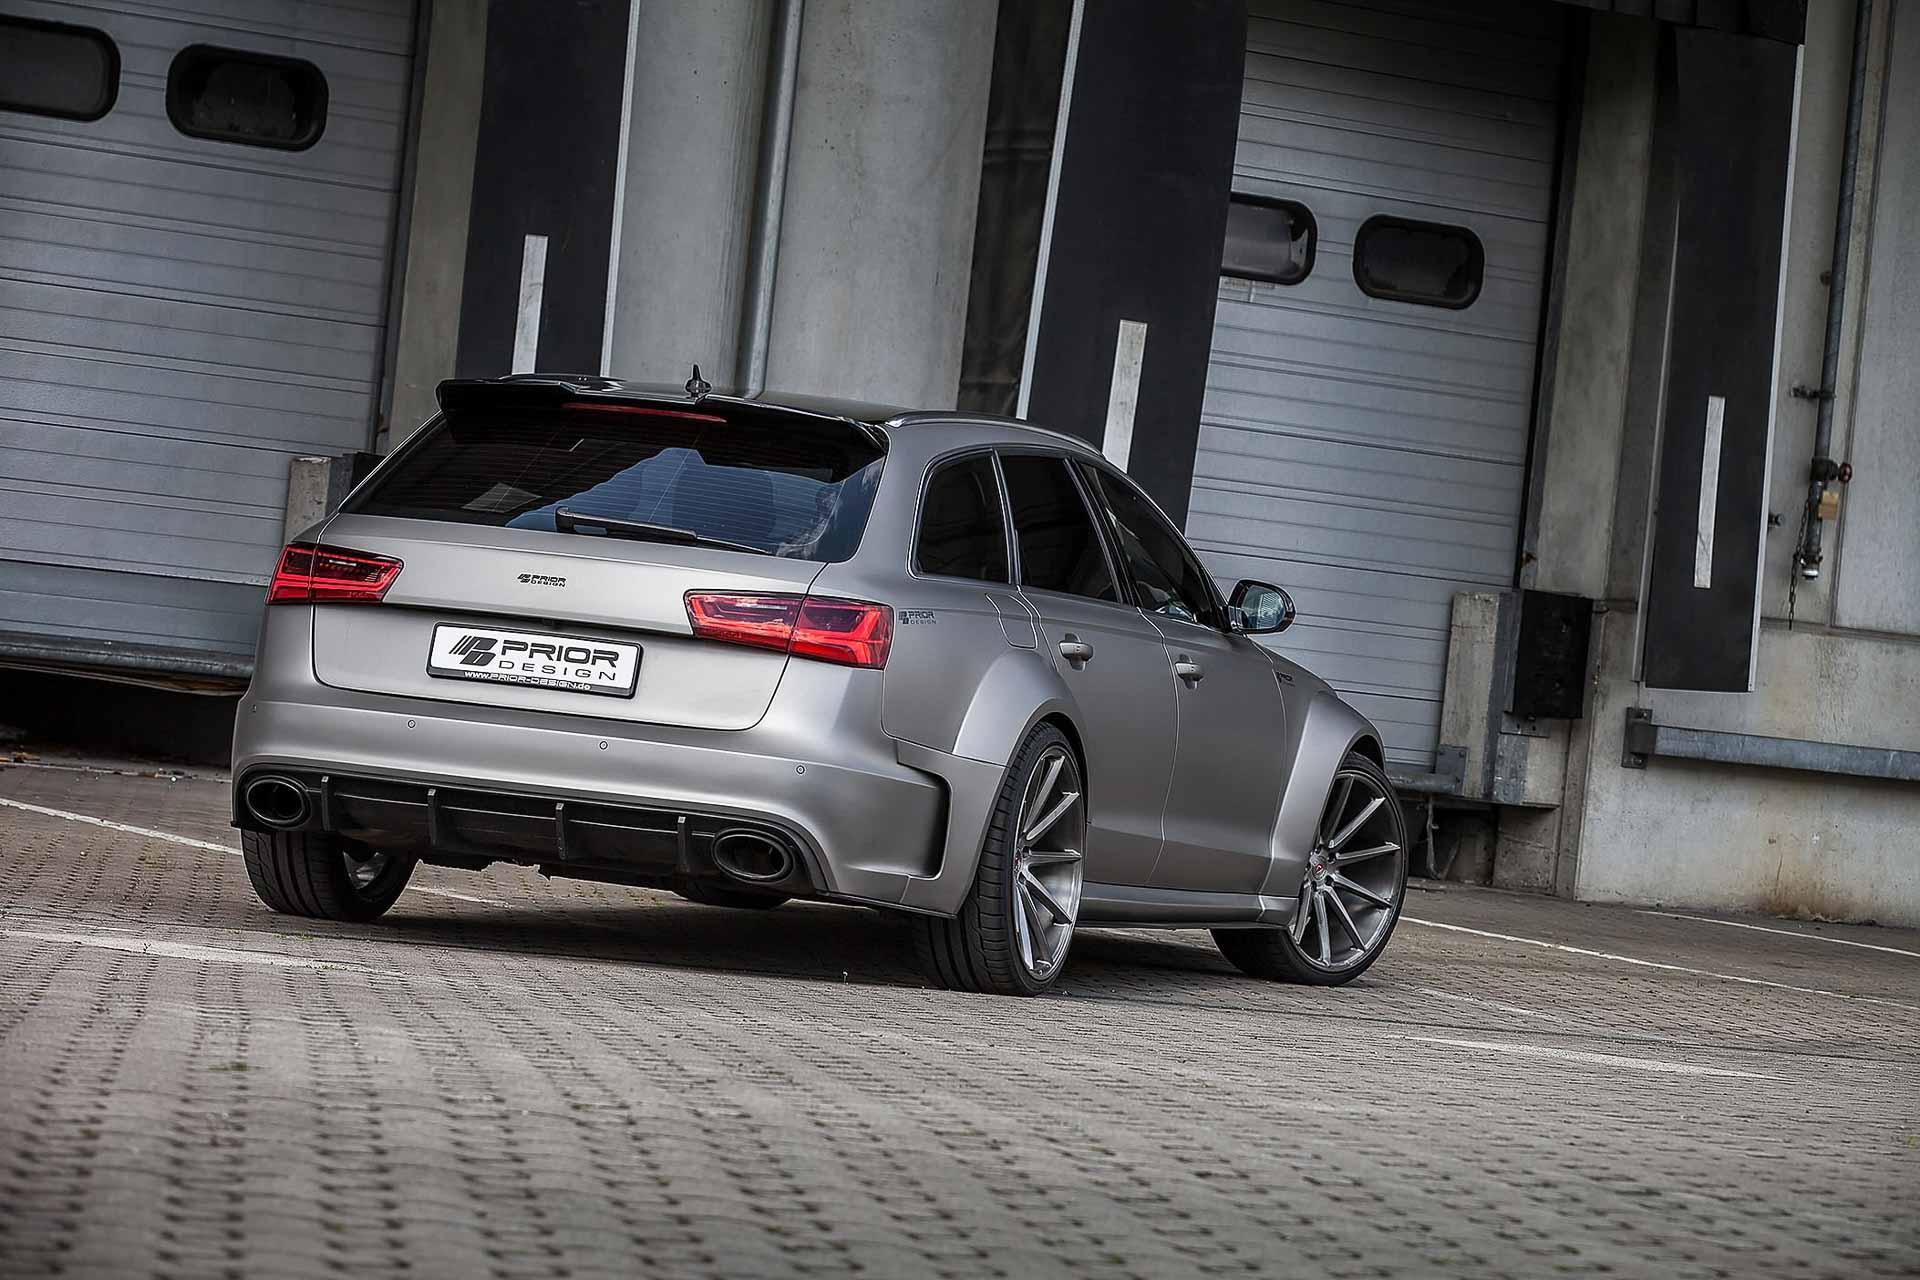 Prior Design Audi A6 S6 Rs6 Avant 2015 2018 Pitlane Tuning Shop